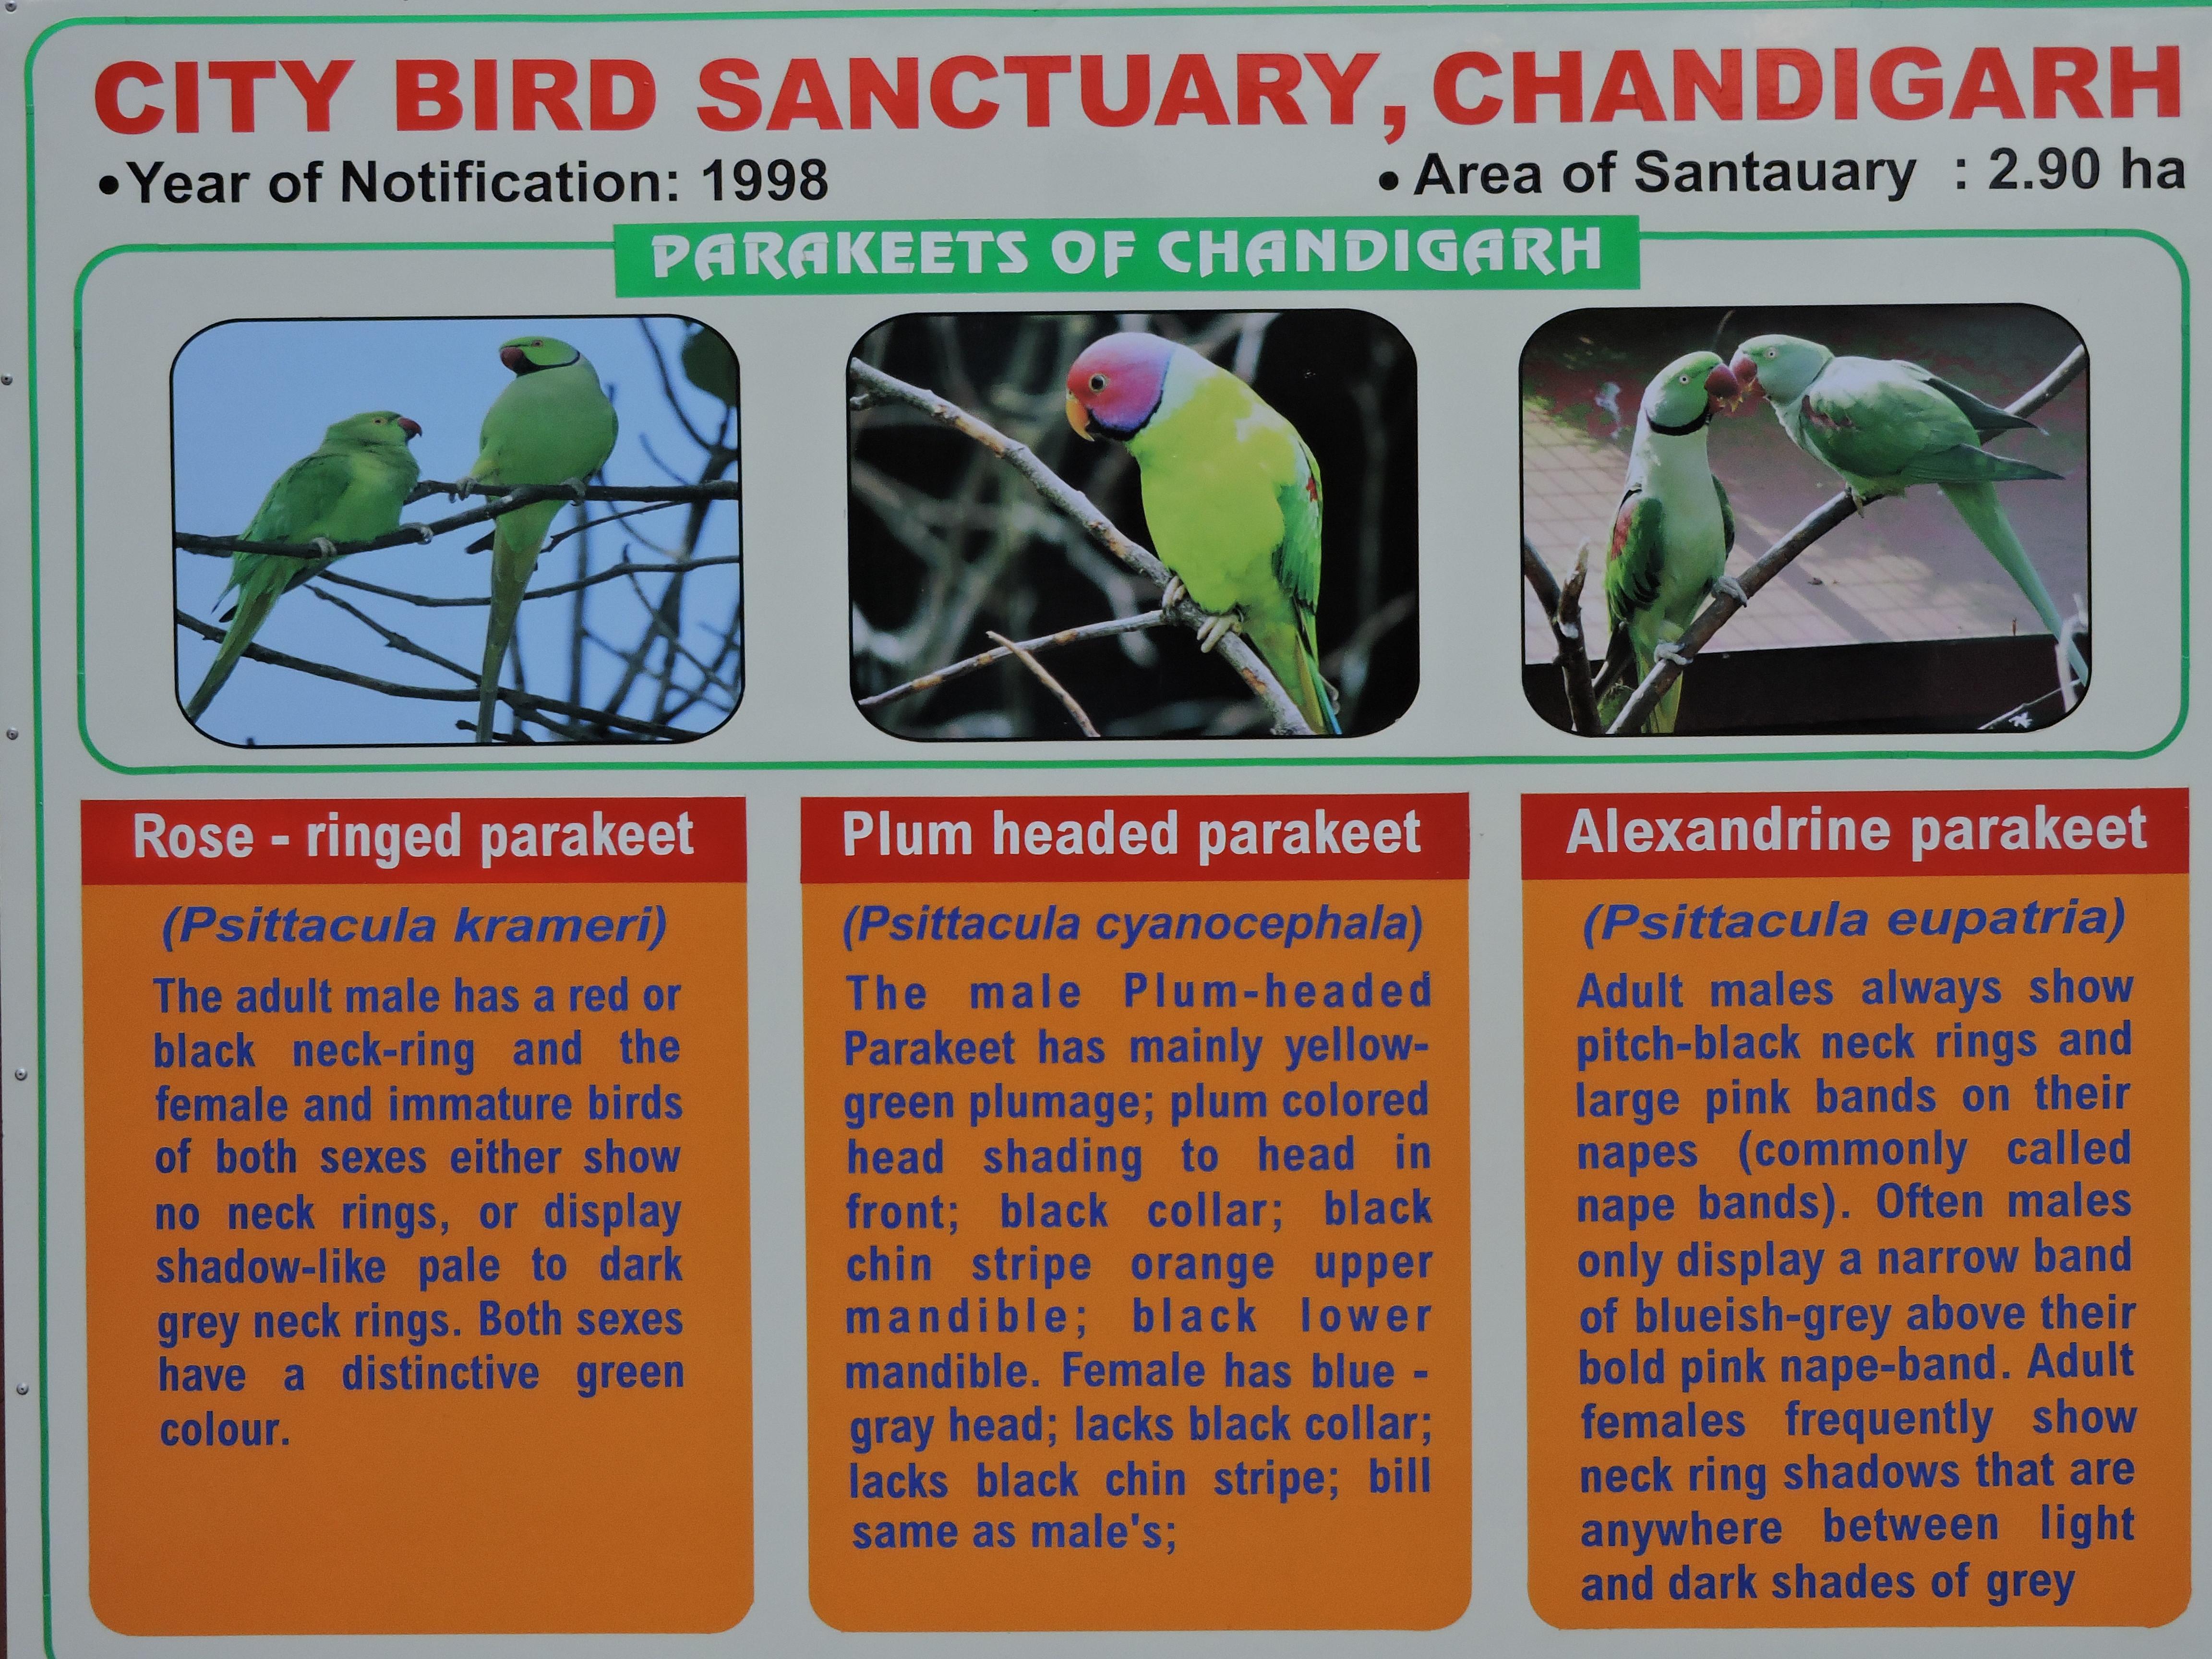 Parrot Bird Sanctuary Chandigarh - Wikipedia